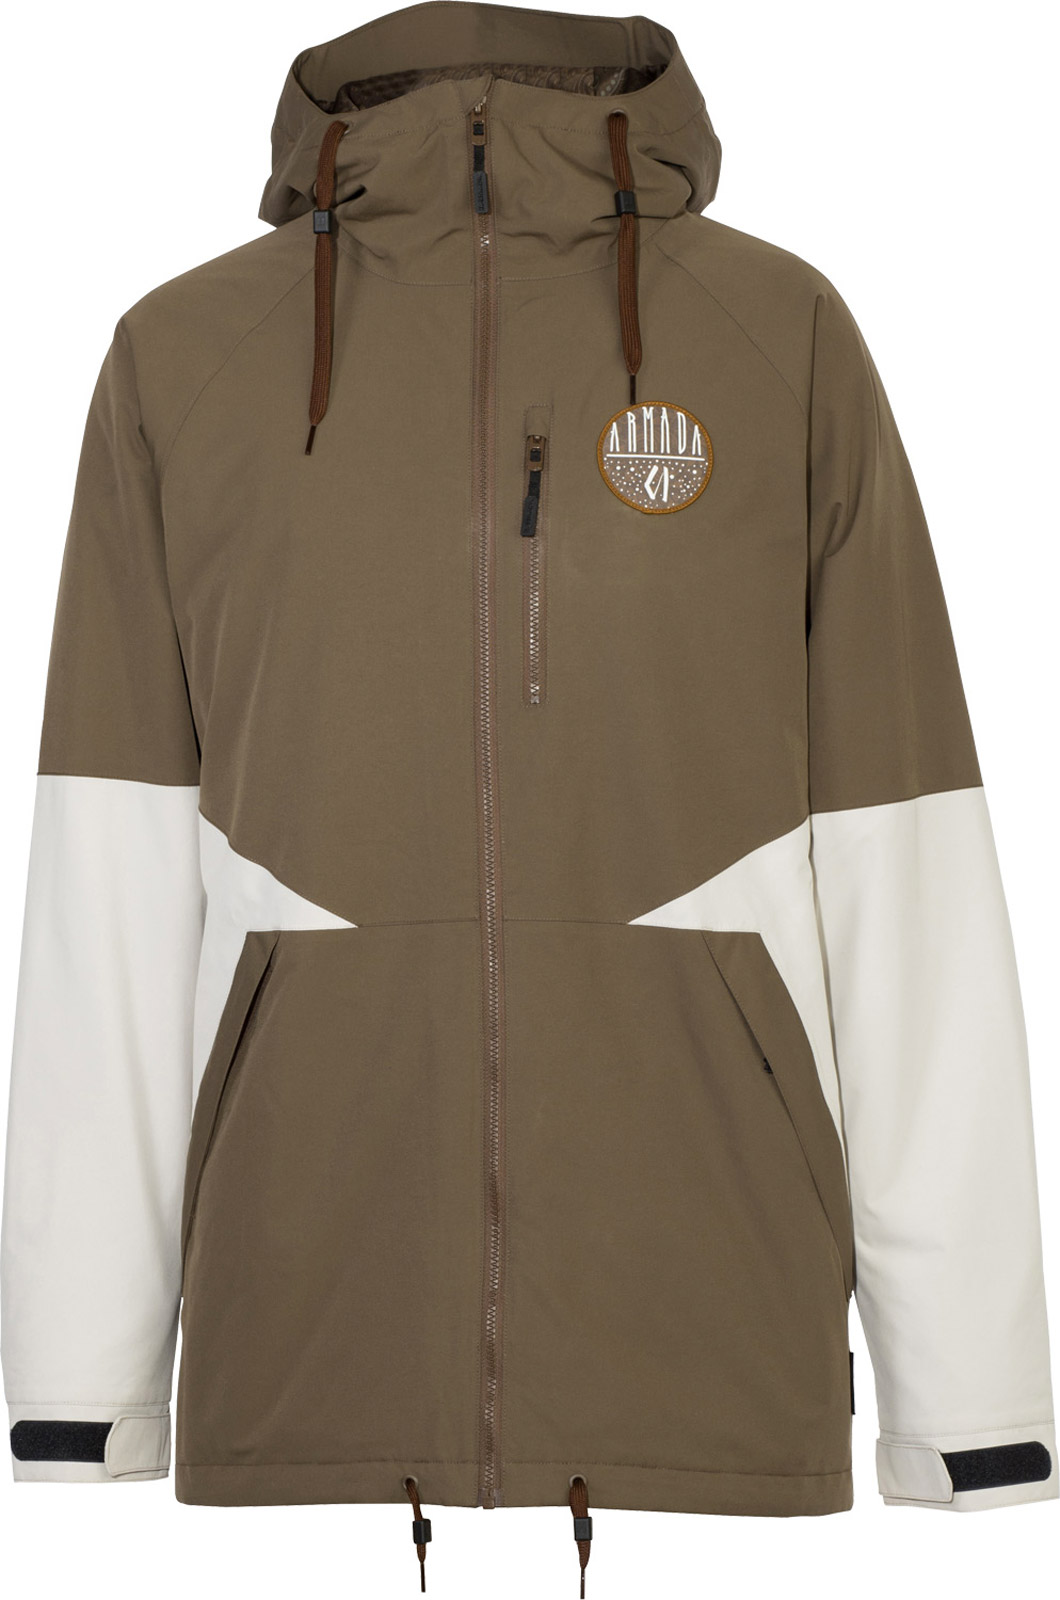 85b2e2dd9 Armada Carson Insulated Ski Jacket